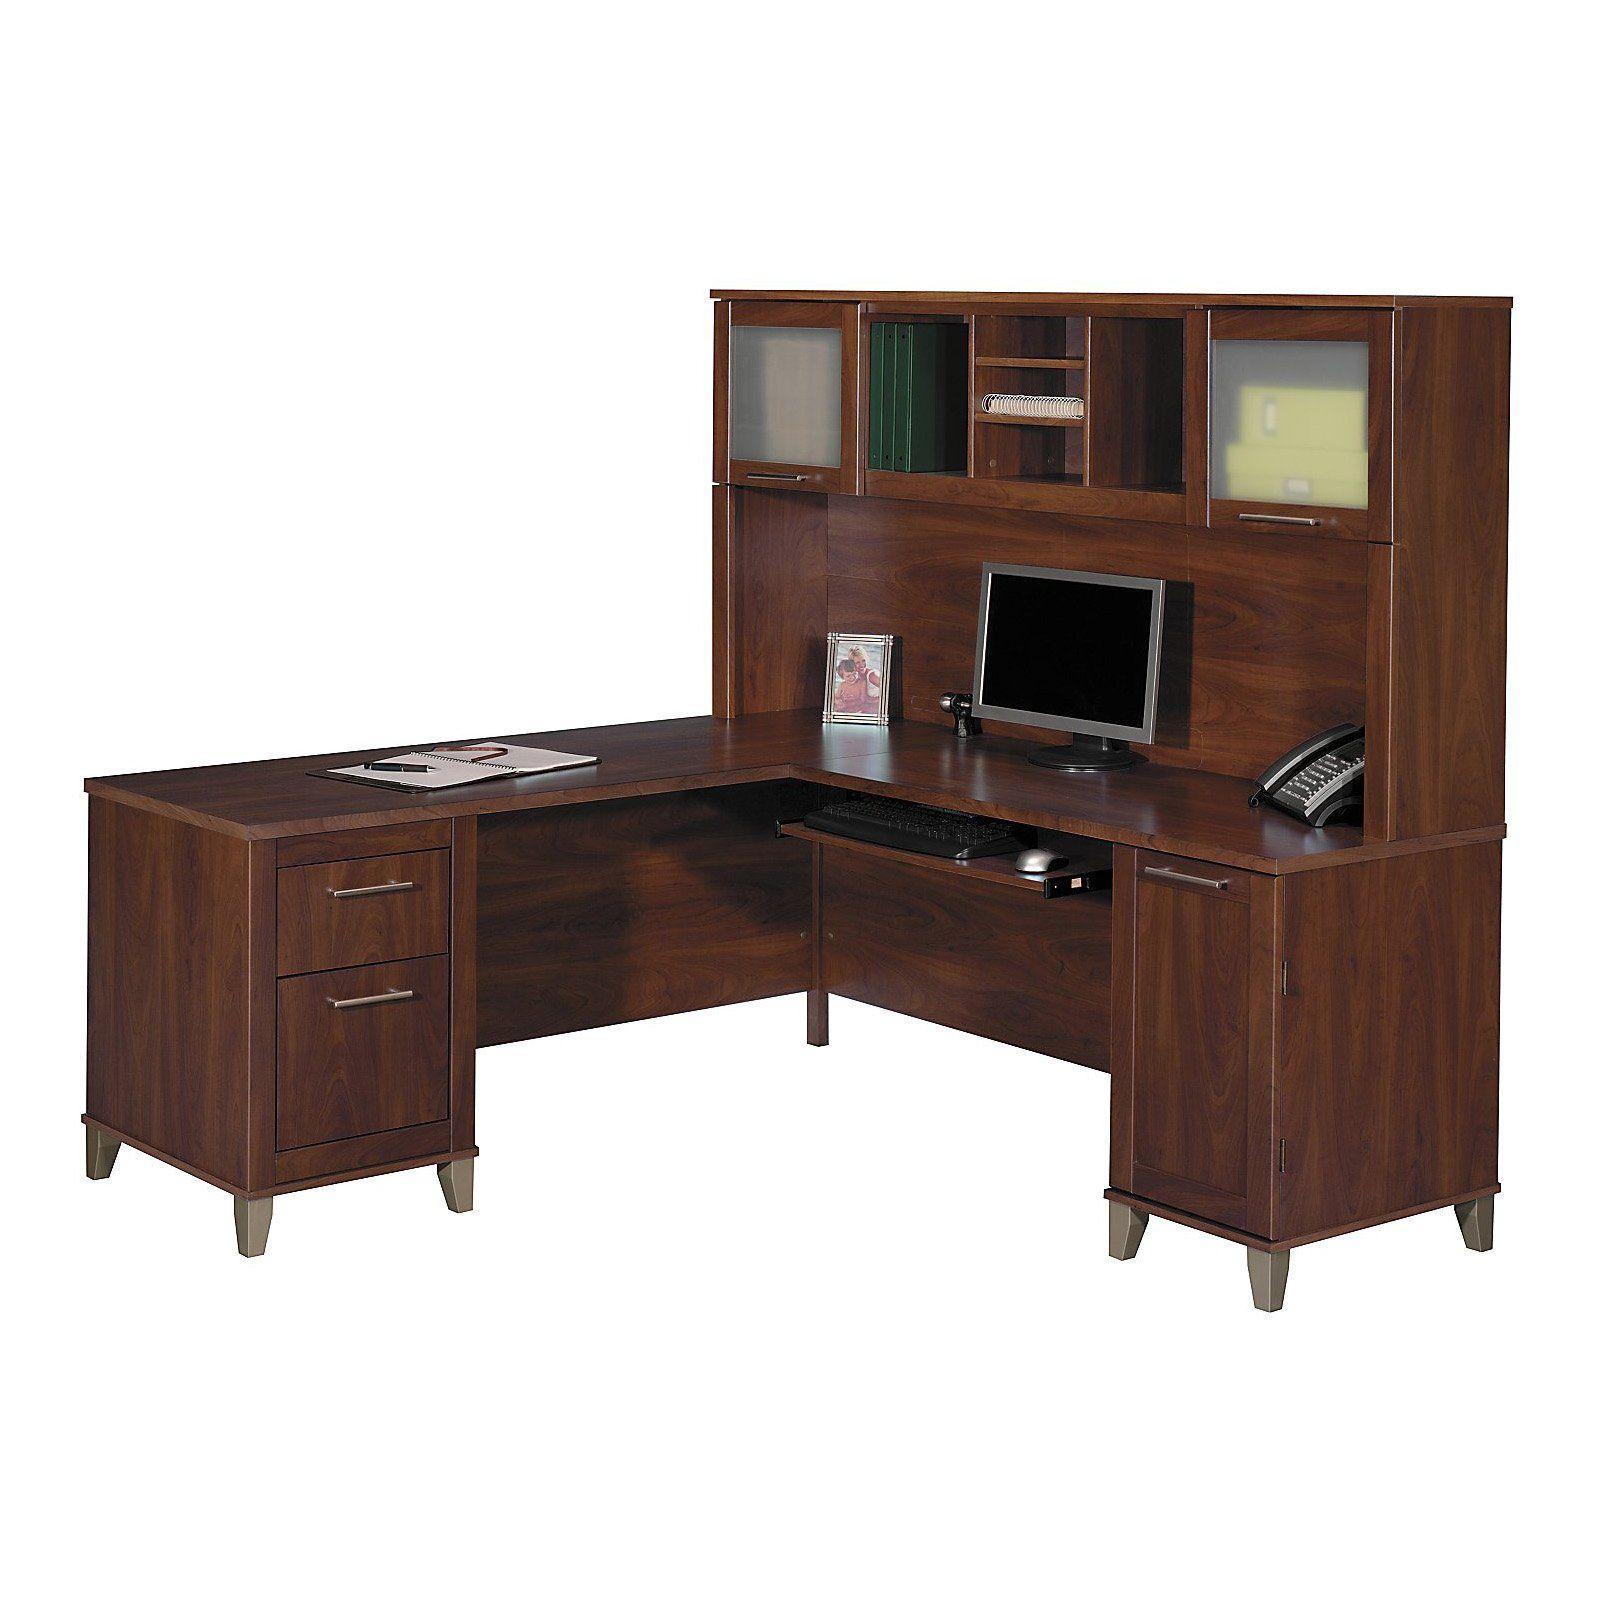 Bush somerset l shaped desk with hutch cherry desks pinterest somerset and desks - Cherry wood computer desk with hutch ...